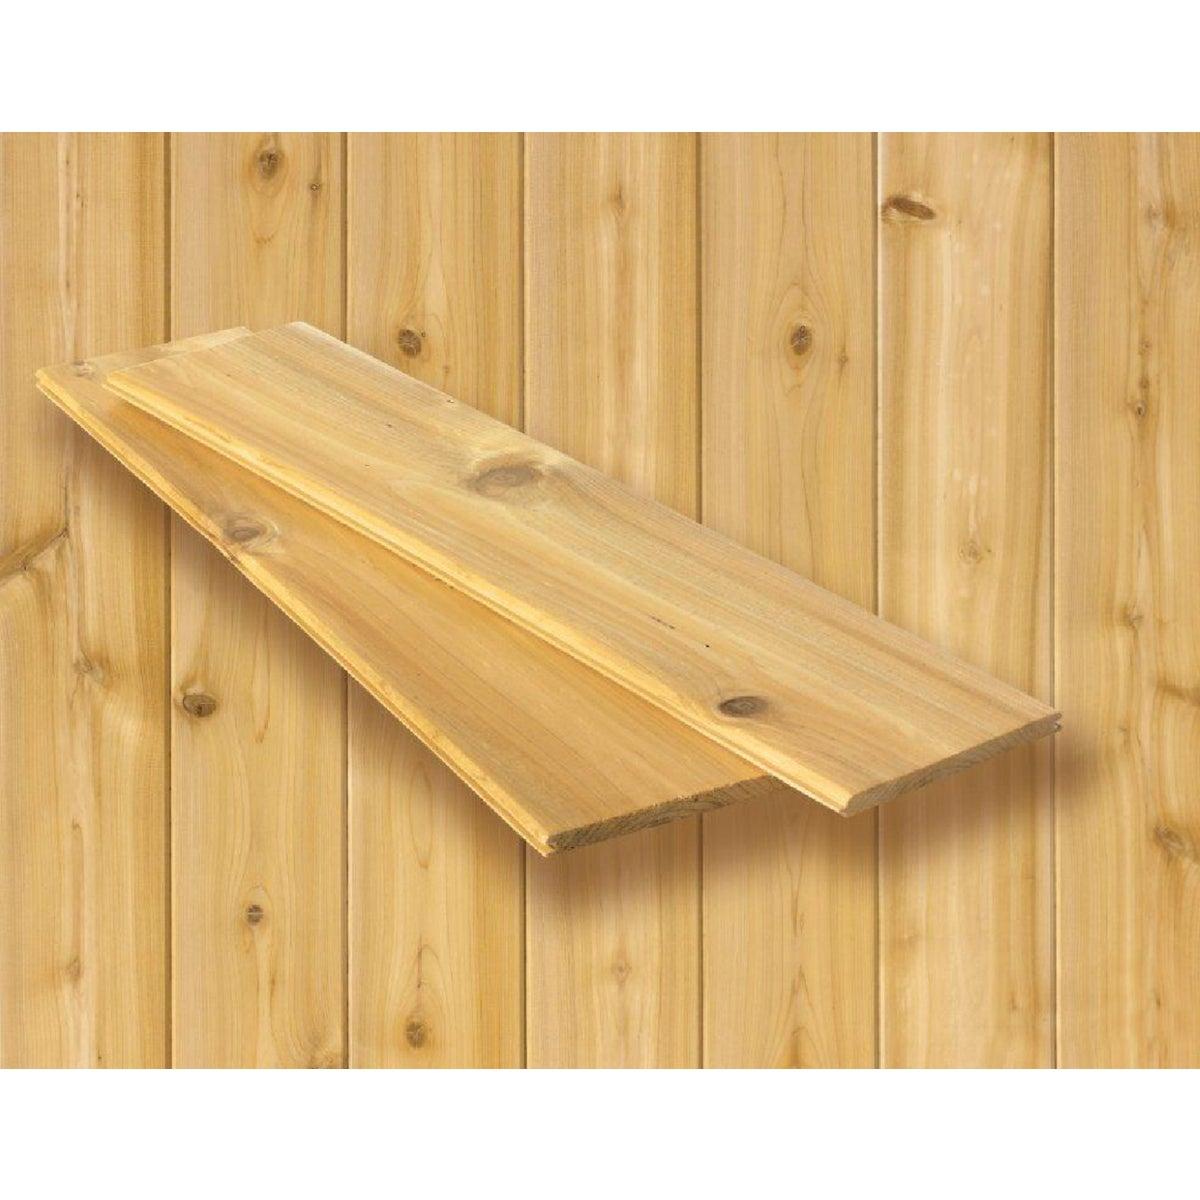 V-Edge Cedar Paneling